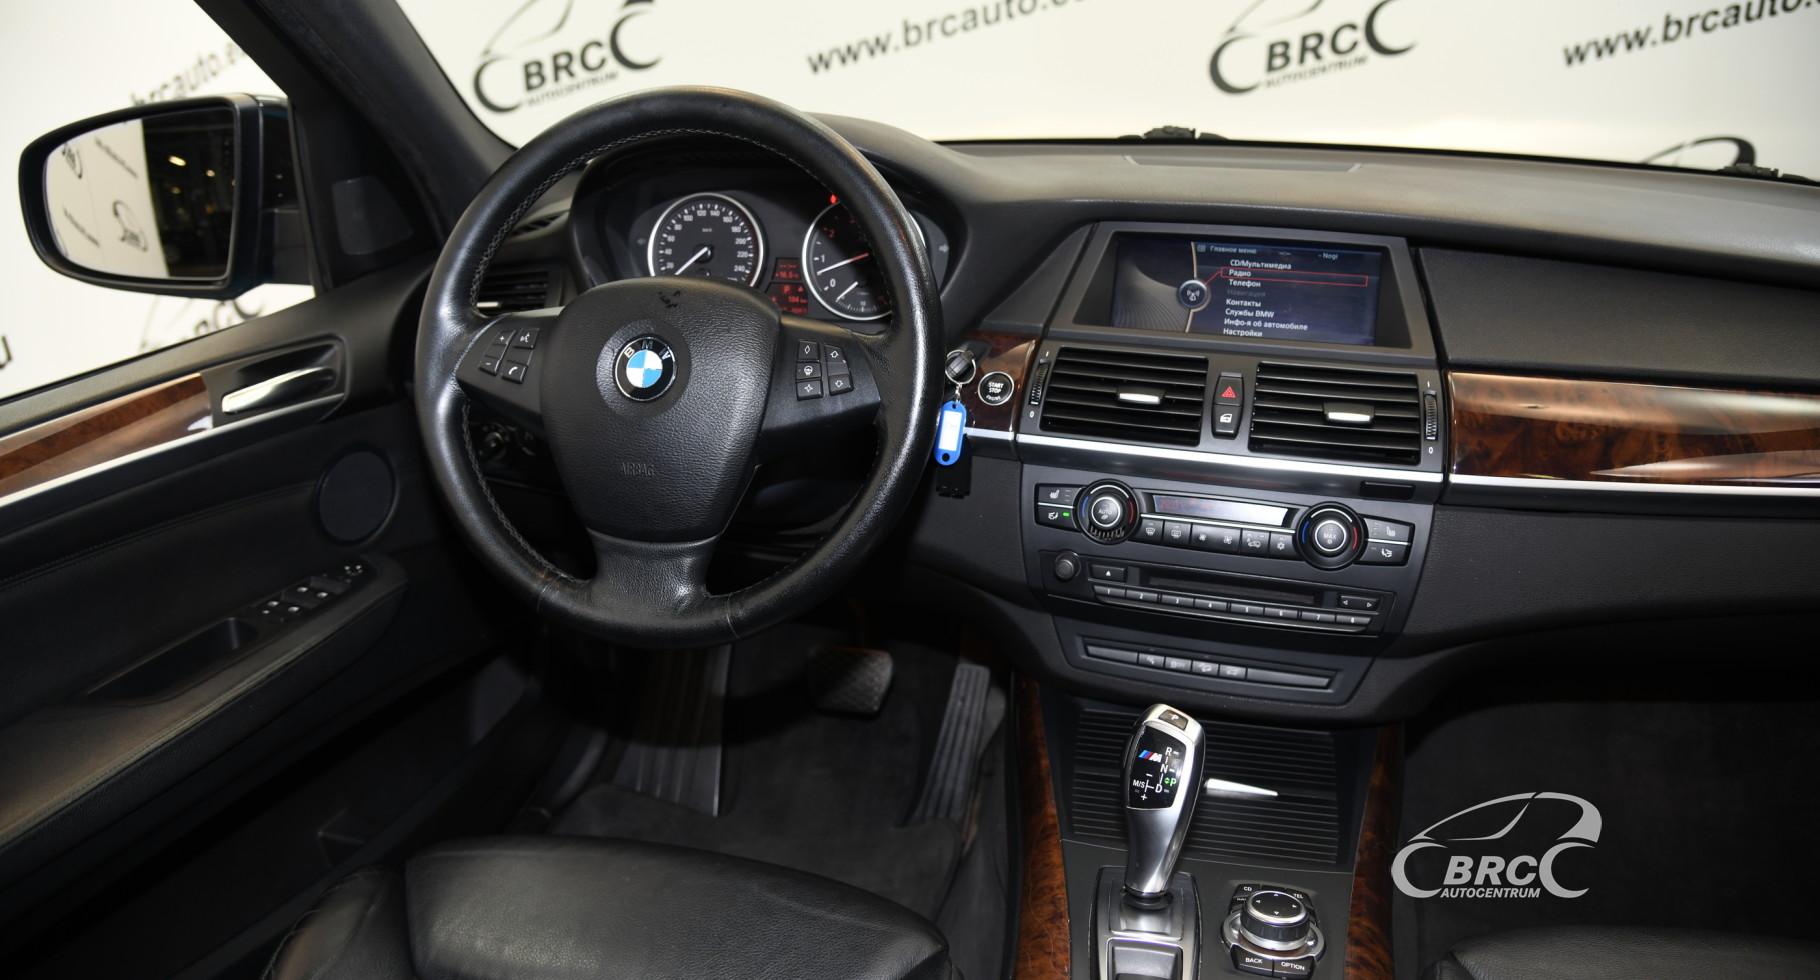 BMW X5 4.8i M-Pakett Automatas